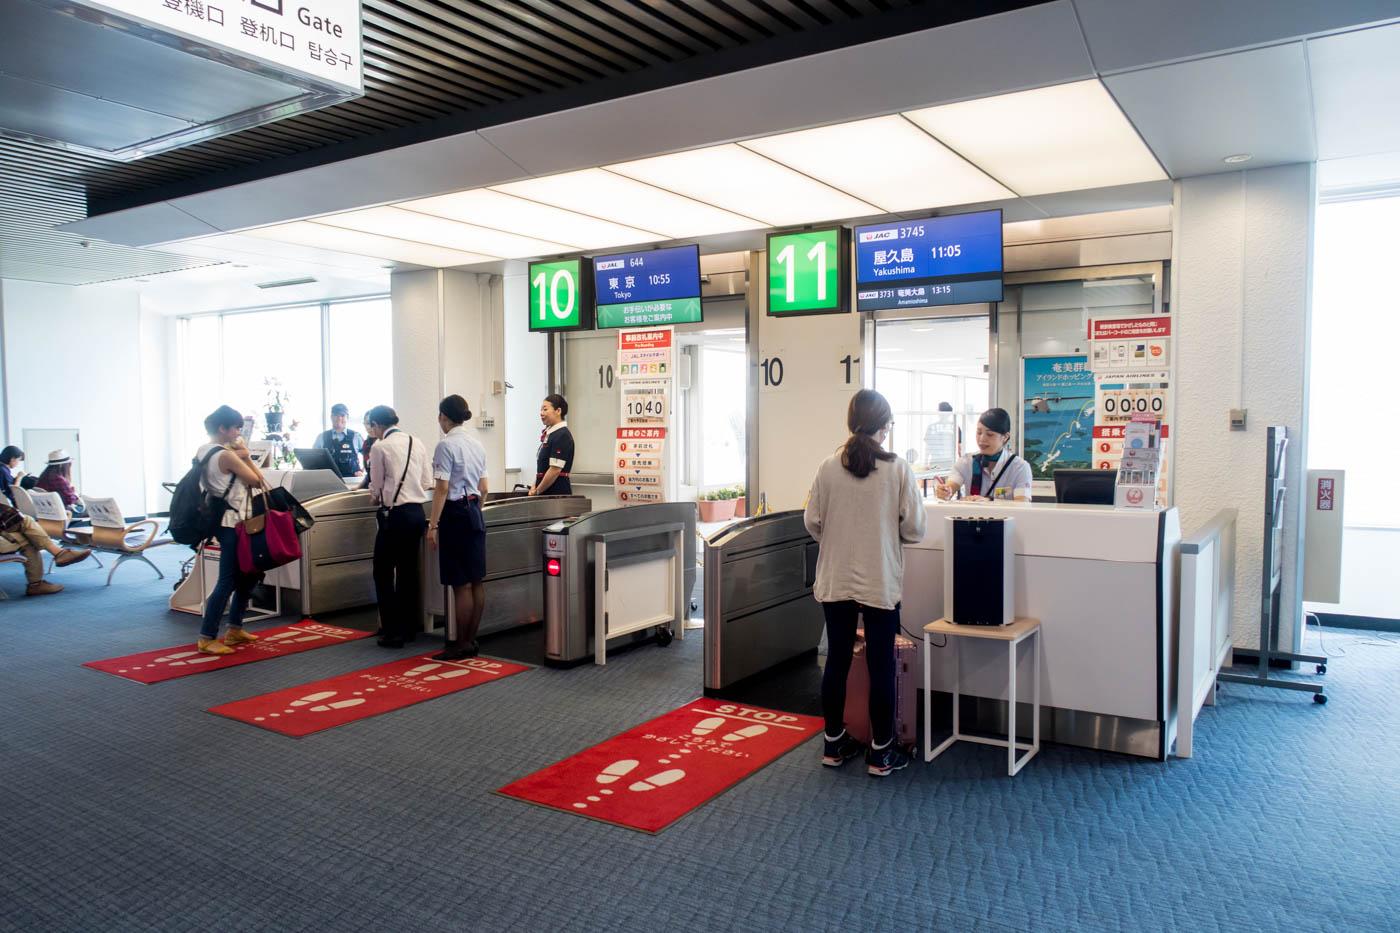 Kagoshima Airport Gate 11